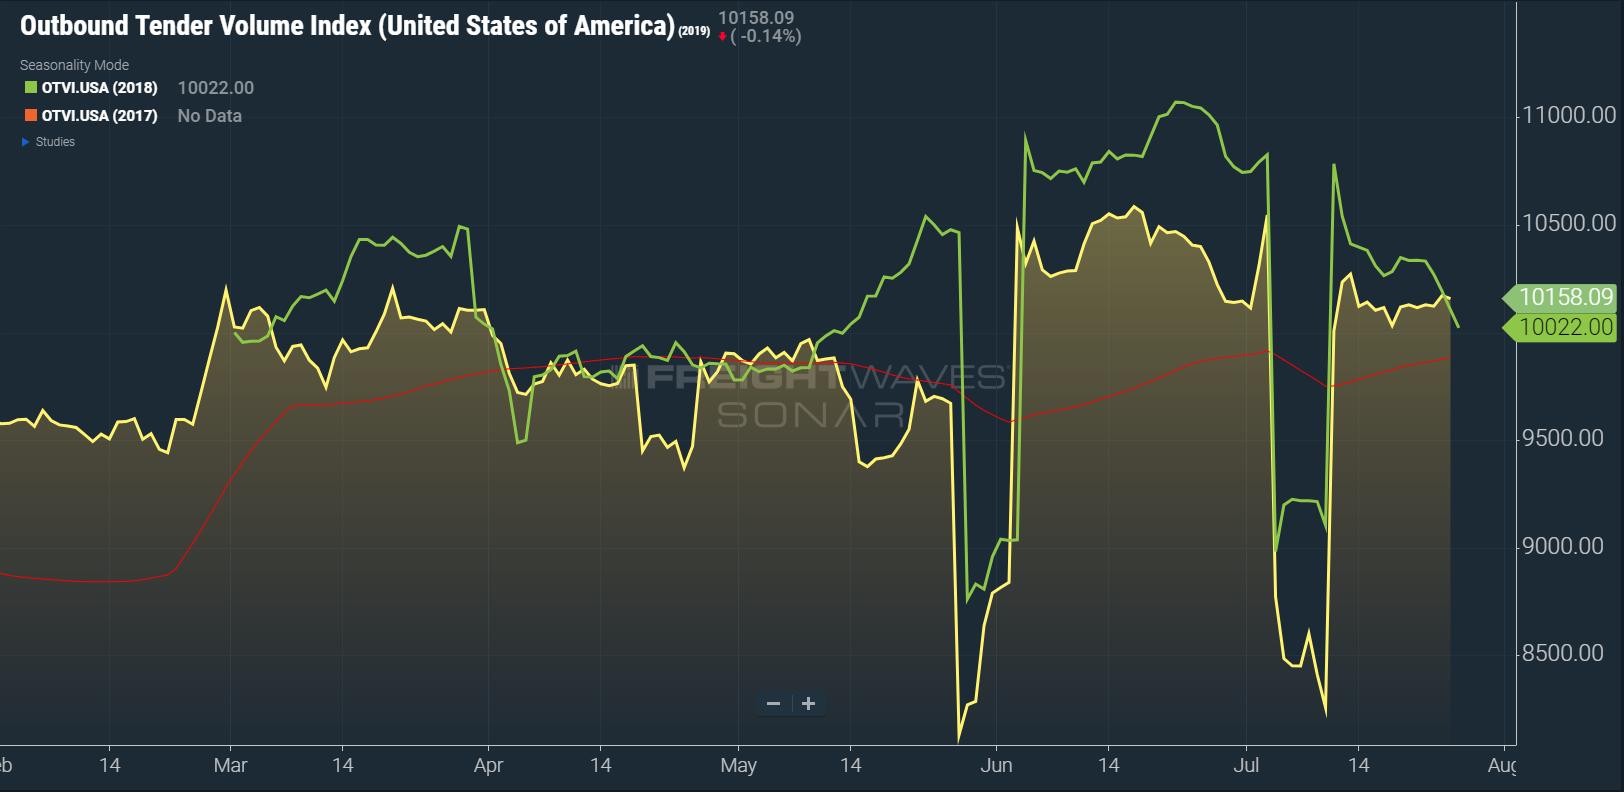 FreightWaves SONAR: (OTVI.USA 2019 (Orange), OTVI.USA 2018 (Green), 60-day Moving Average (Red)